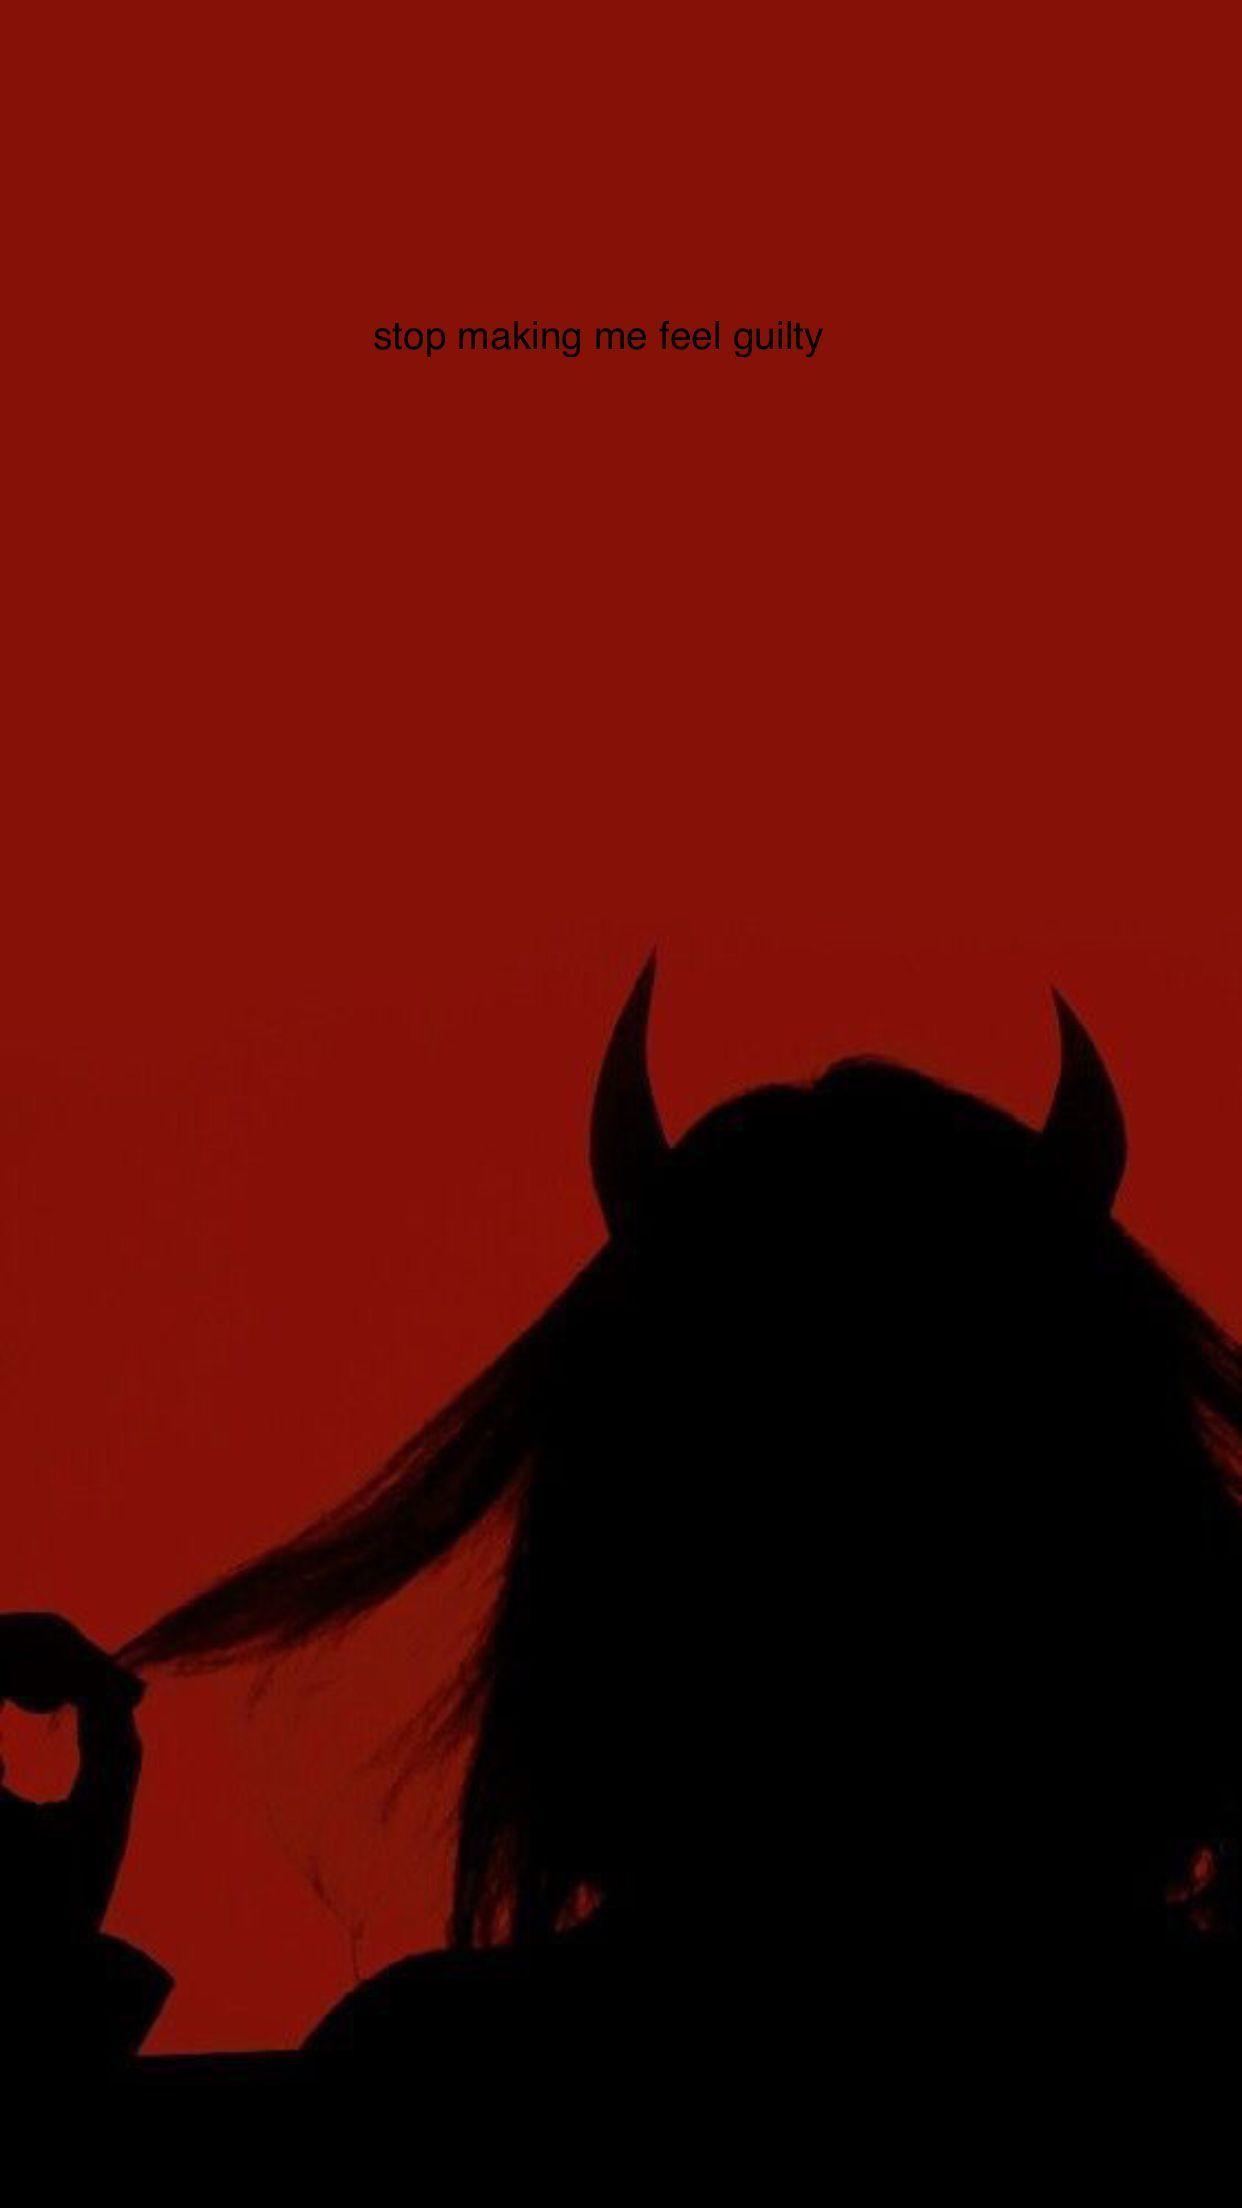 L Redaesthetic Dailycomics In 2020 Bad Girl Wallpaper Red Aesthetic Red Aesthetic Grunge